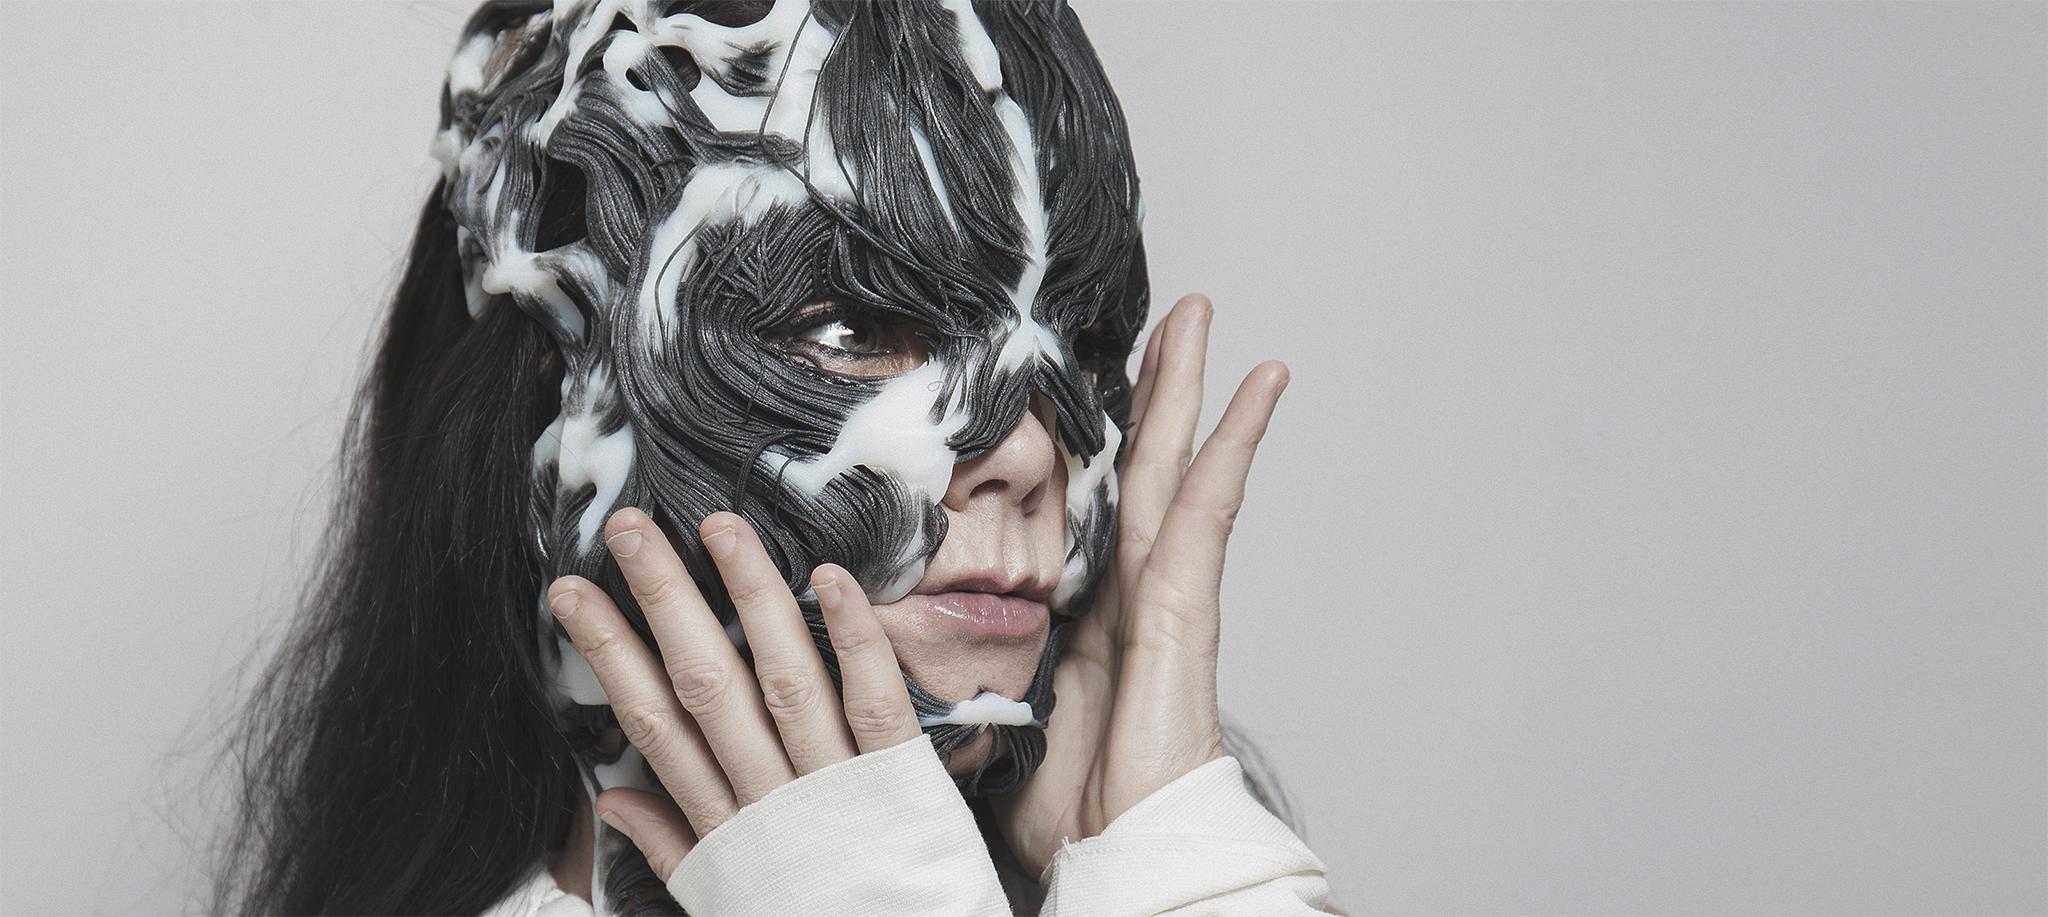 Bjork-Rottlace-3D-Mask